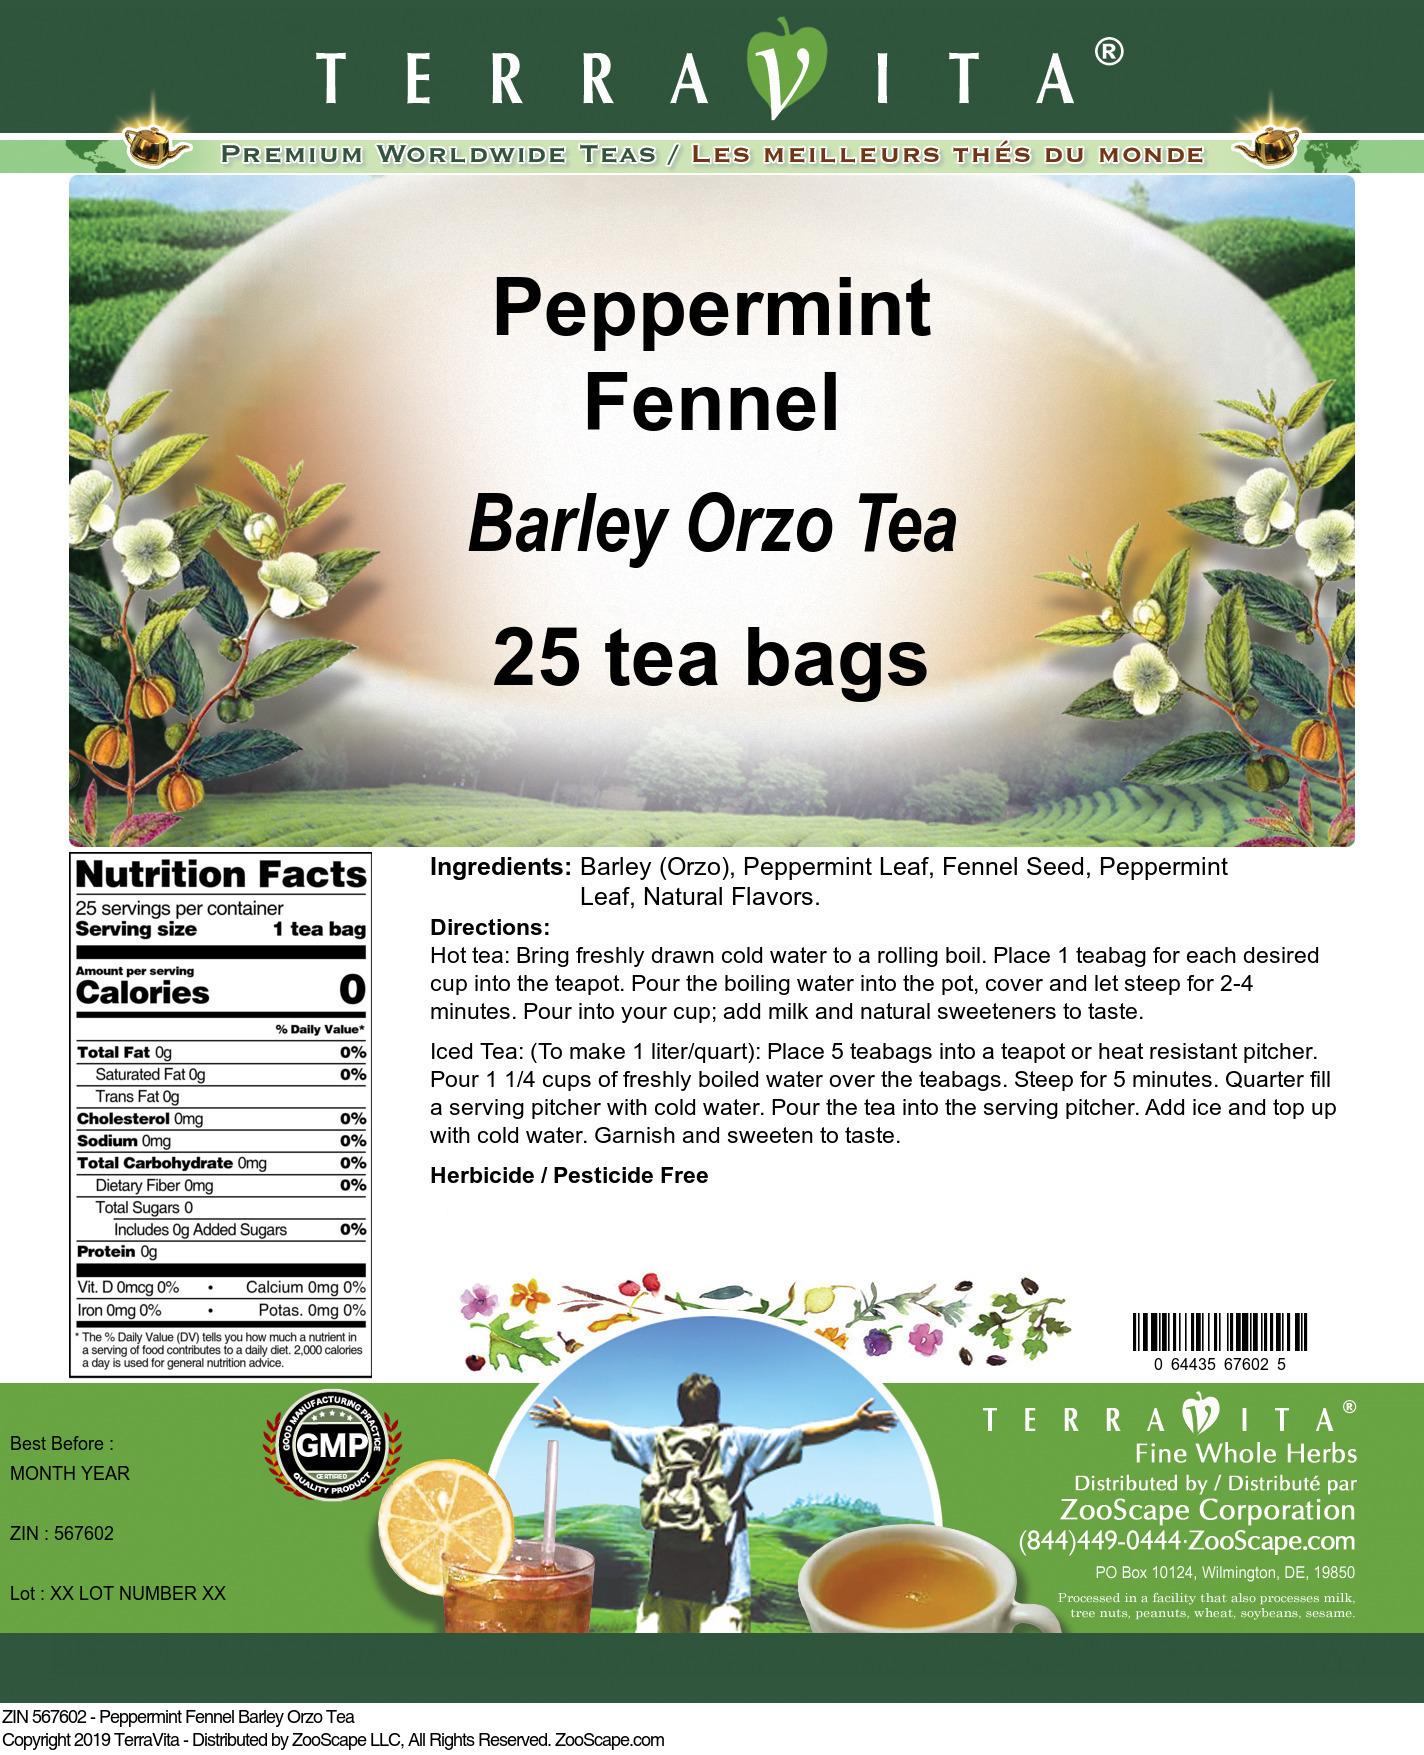 Peppermint Fennel Barley Orzo